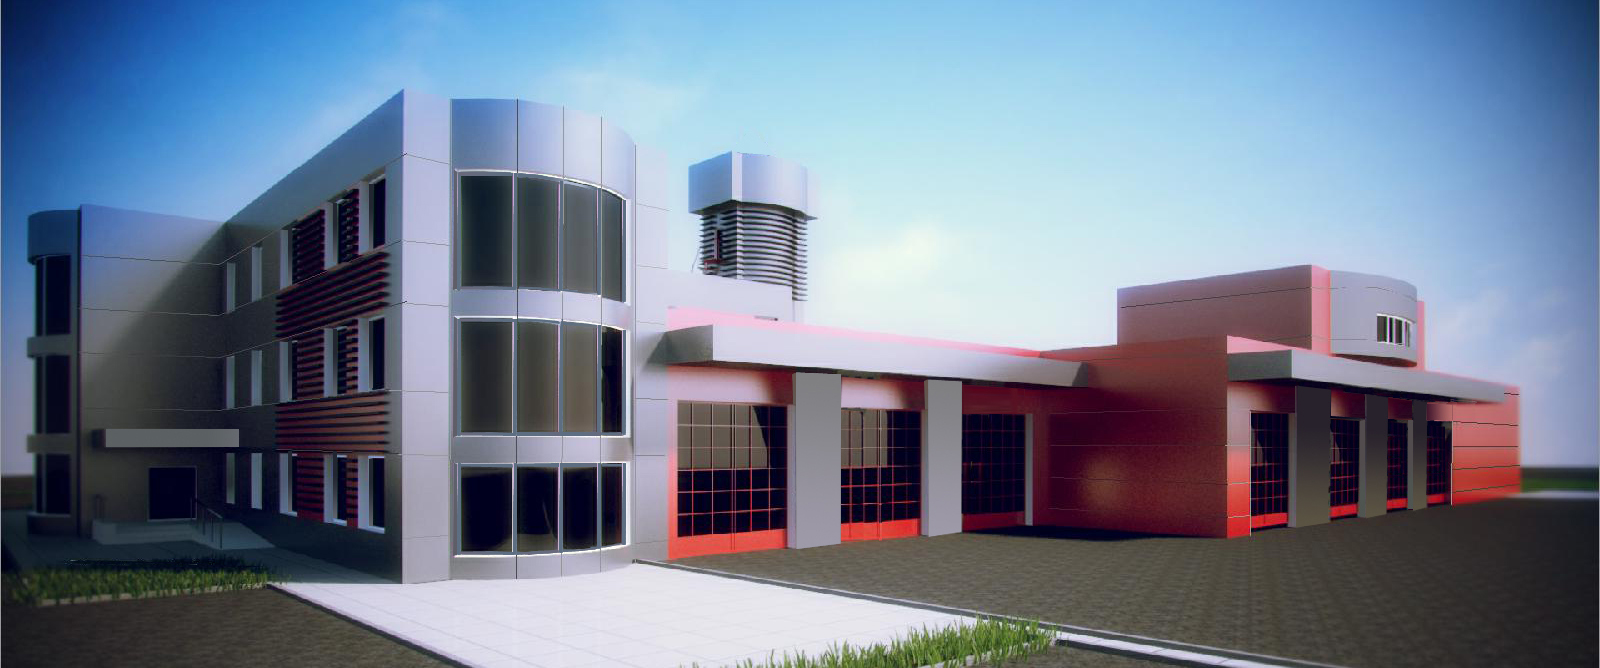 Фасады 3-Model